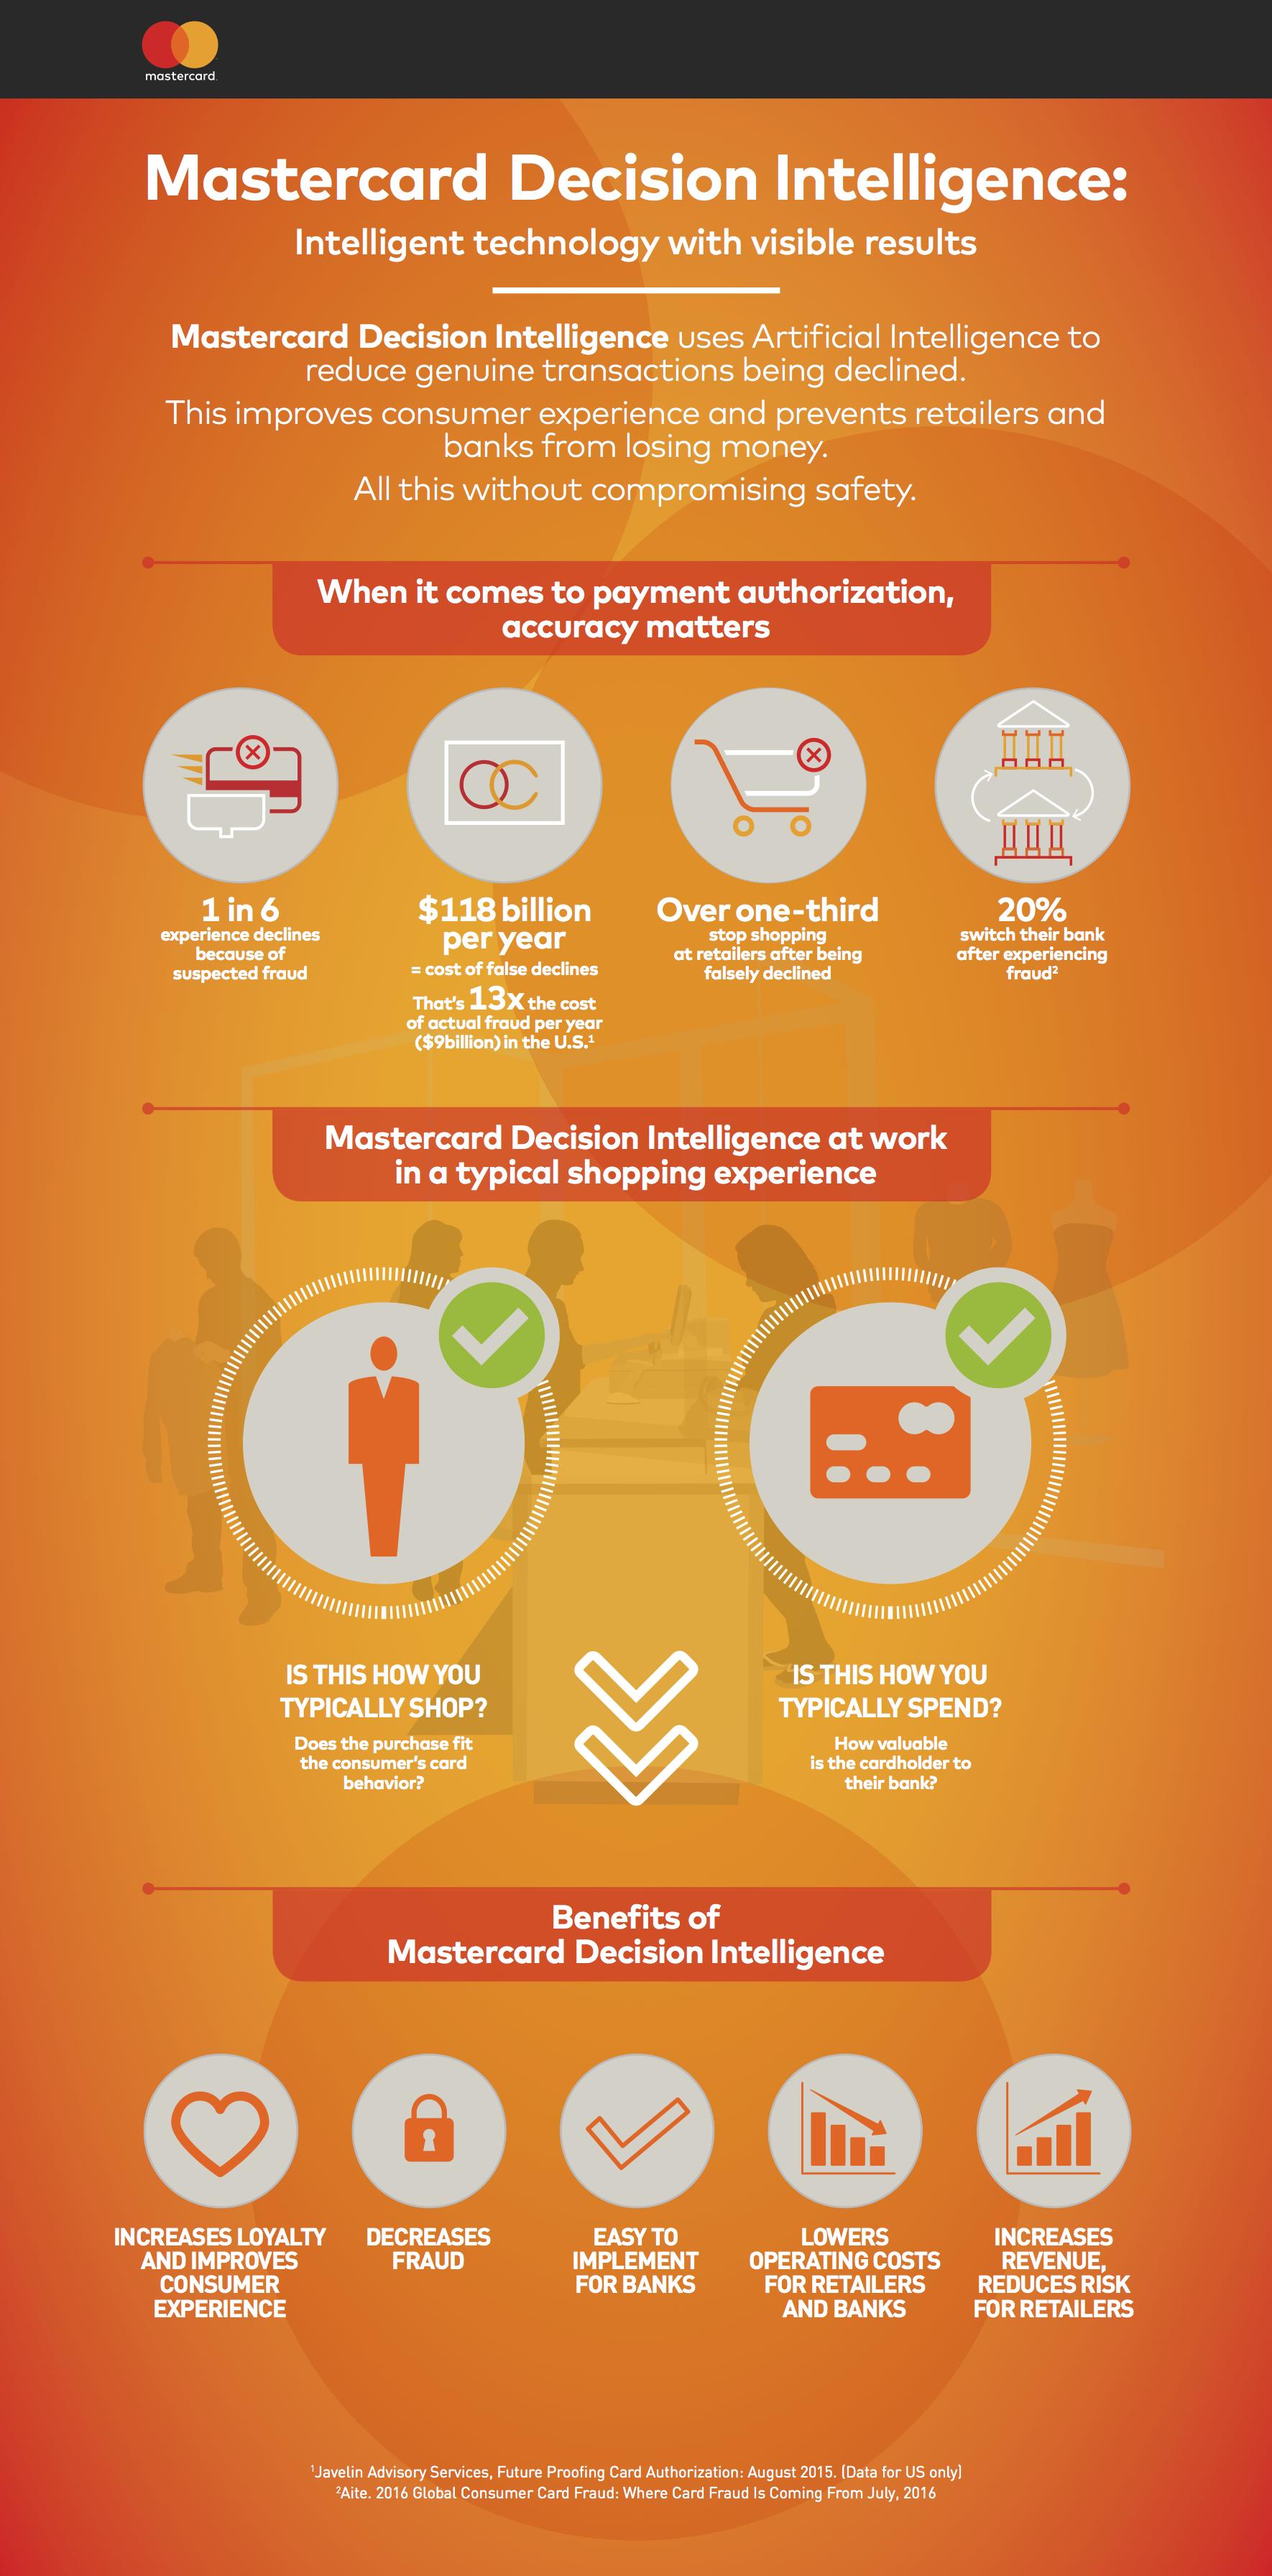 mastercard-decision-intel-infographic-v-6_1-1